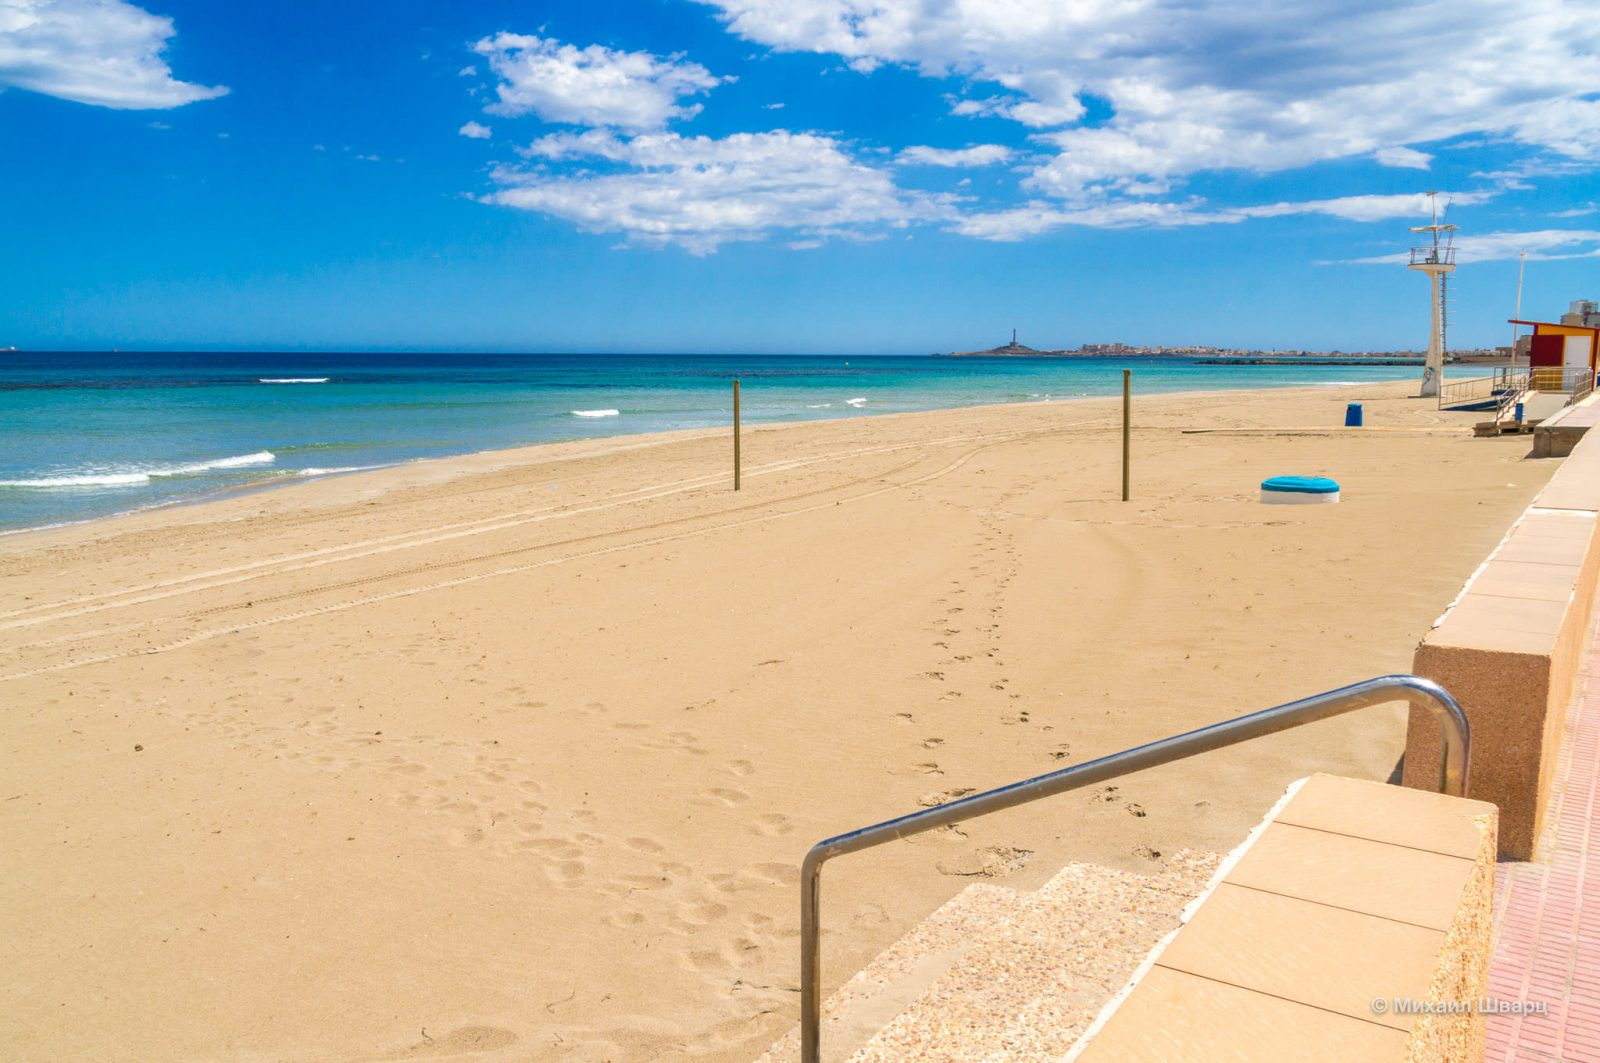 Пляж в Мар-Меноре